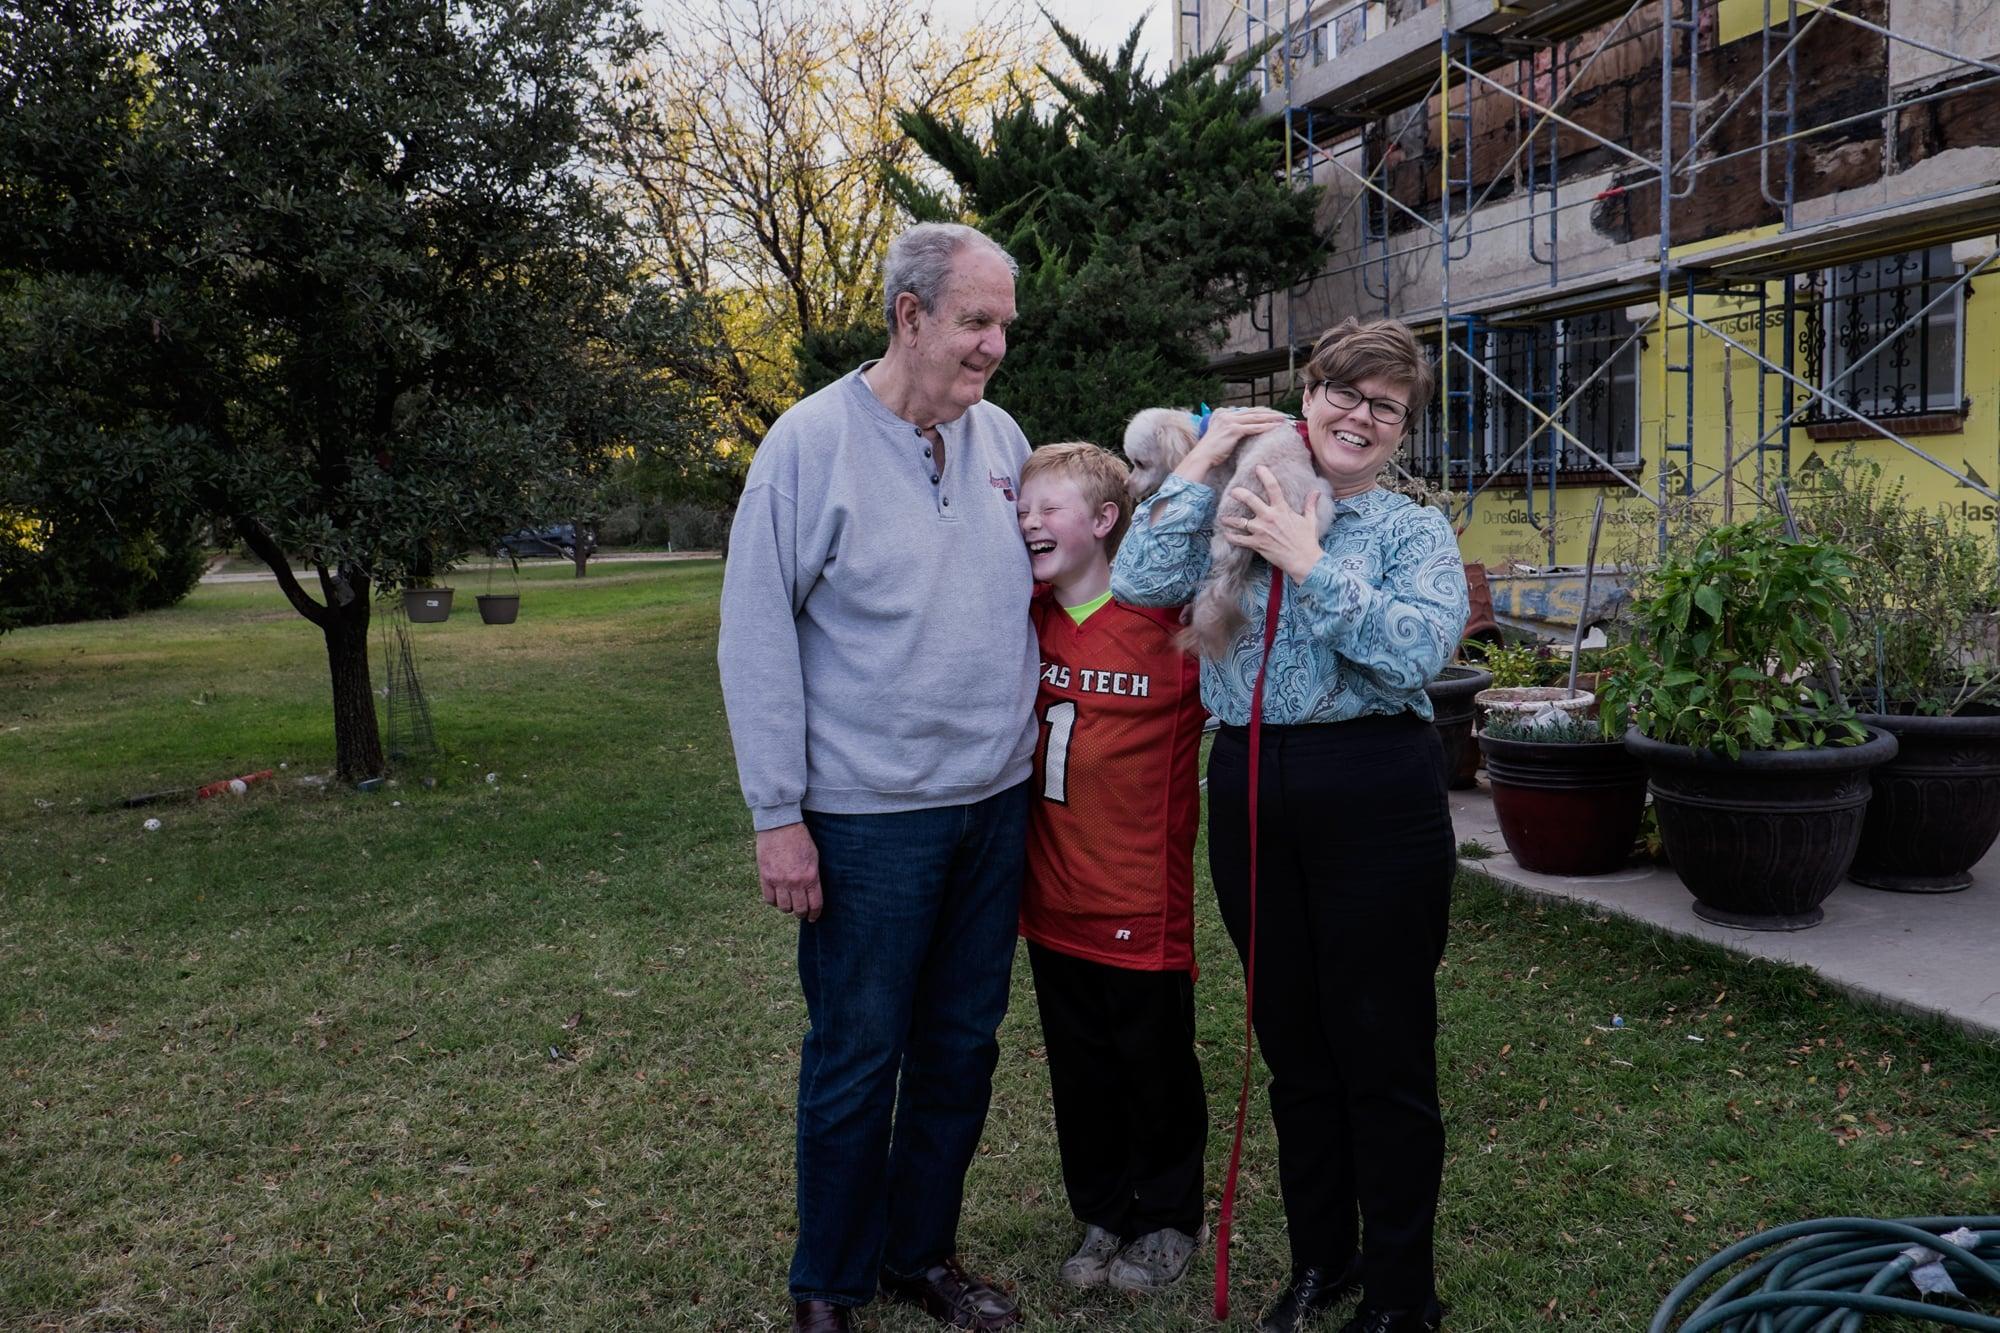 Bill Tydeman with Leslie, Brannen,and Asher, Lubbock, Texas